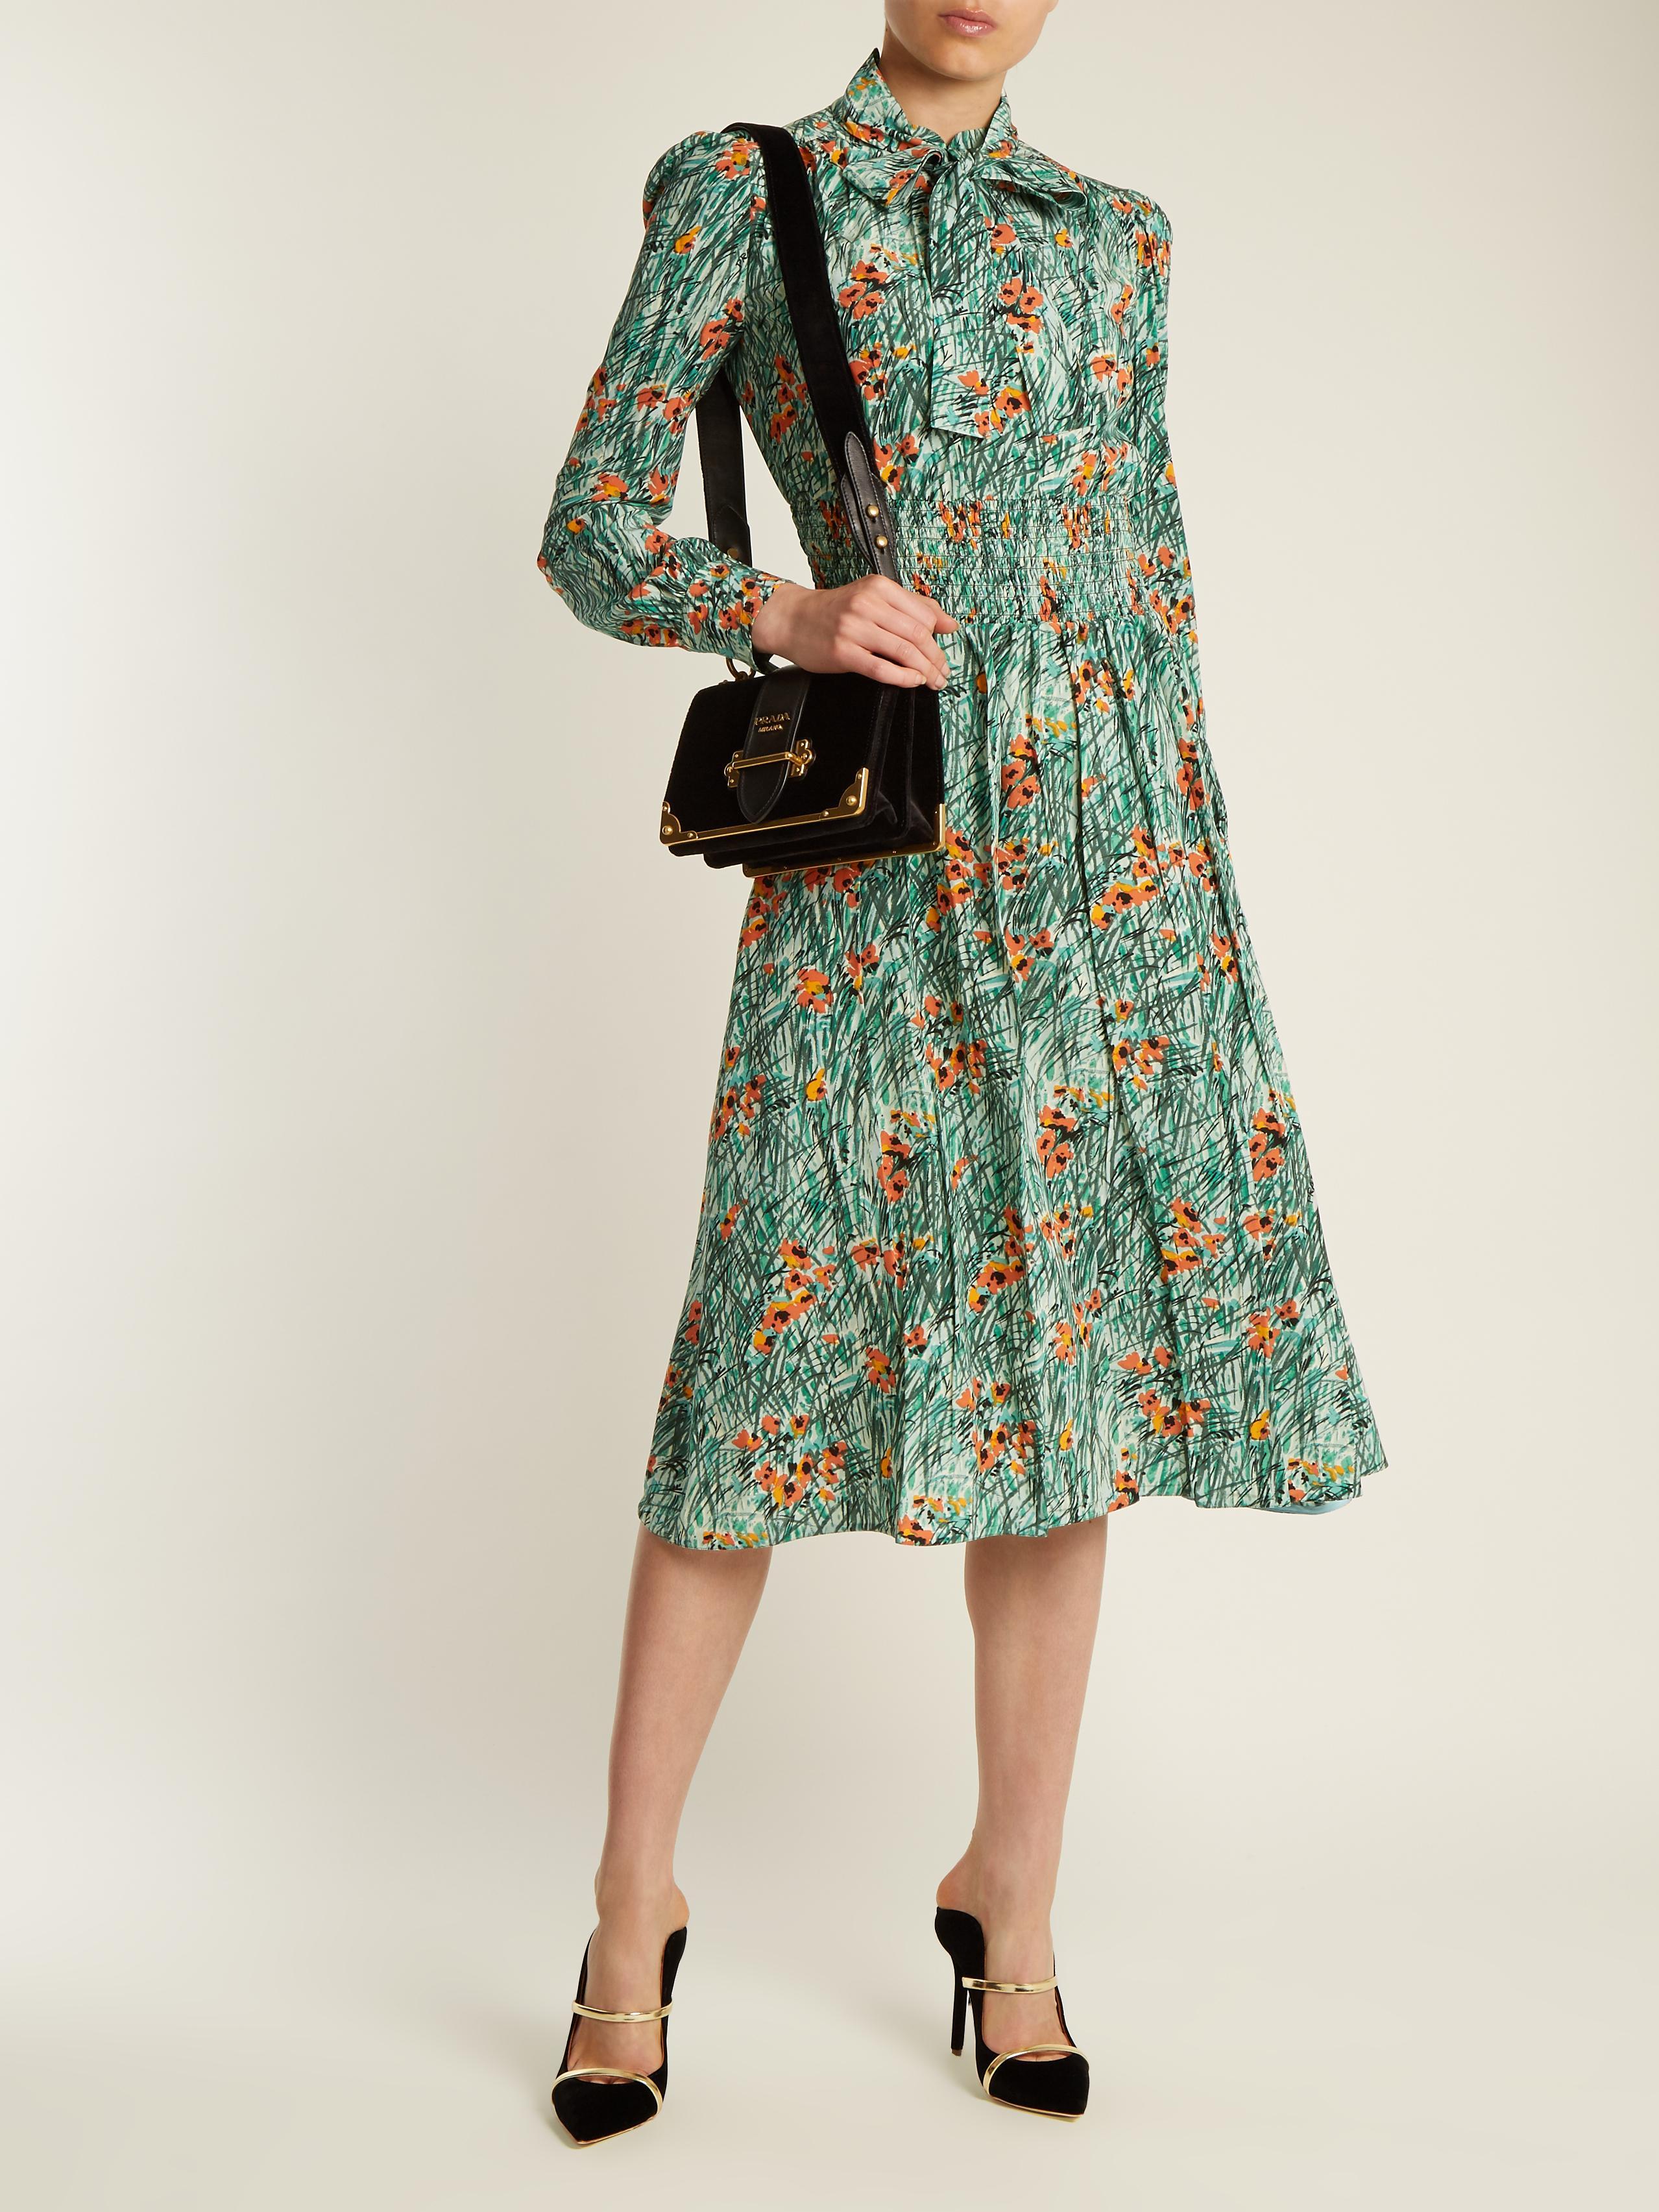 Lyst Prada Poppy Print Silk Crepe Dress In Green